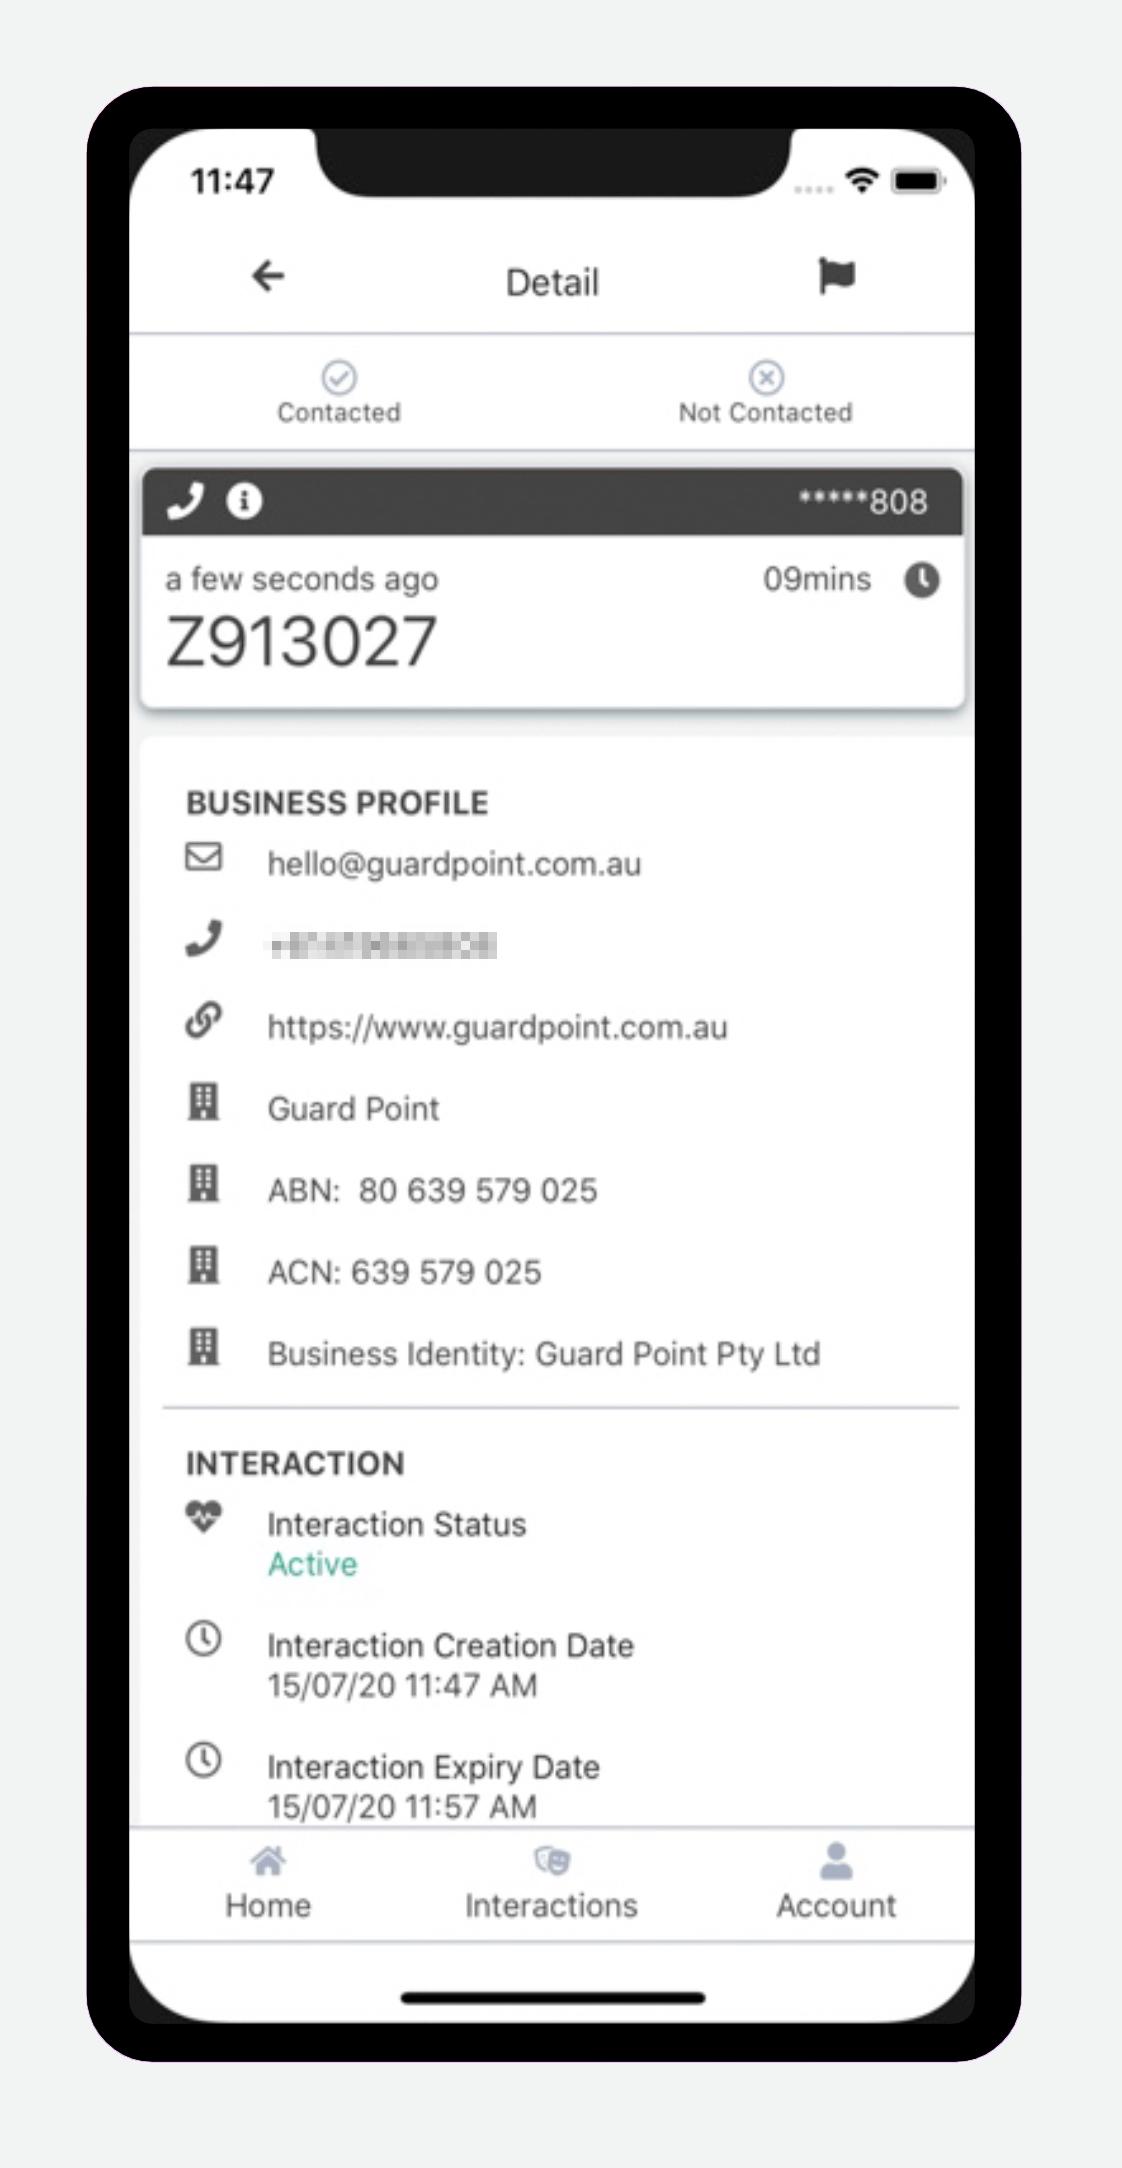 GuardPoint mobile app details